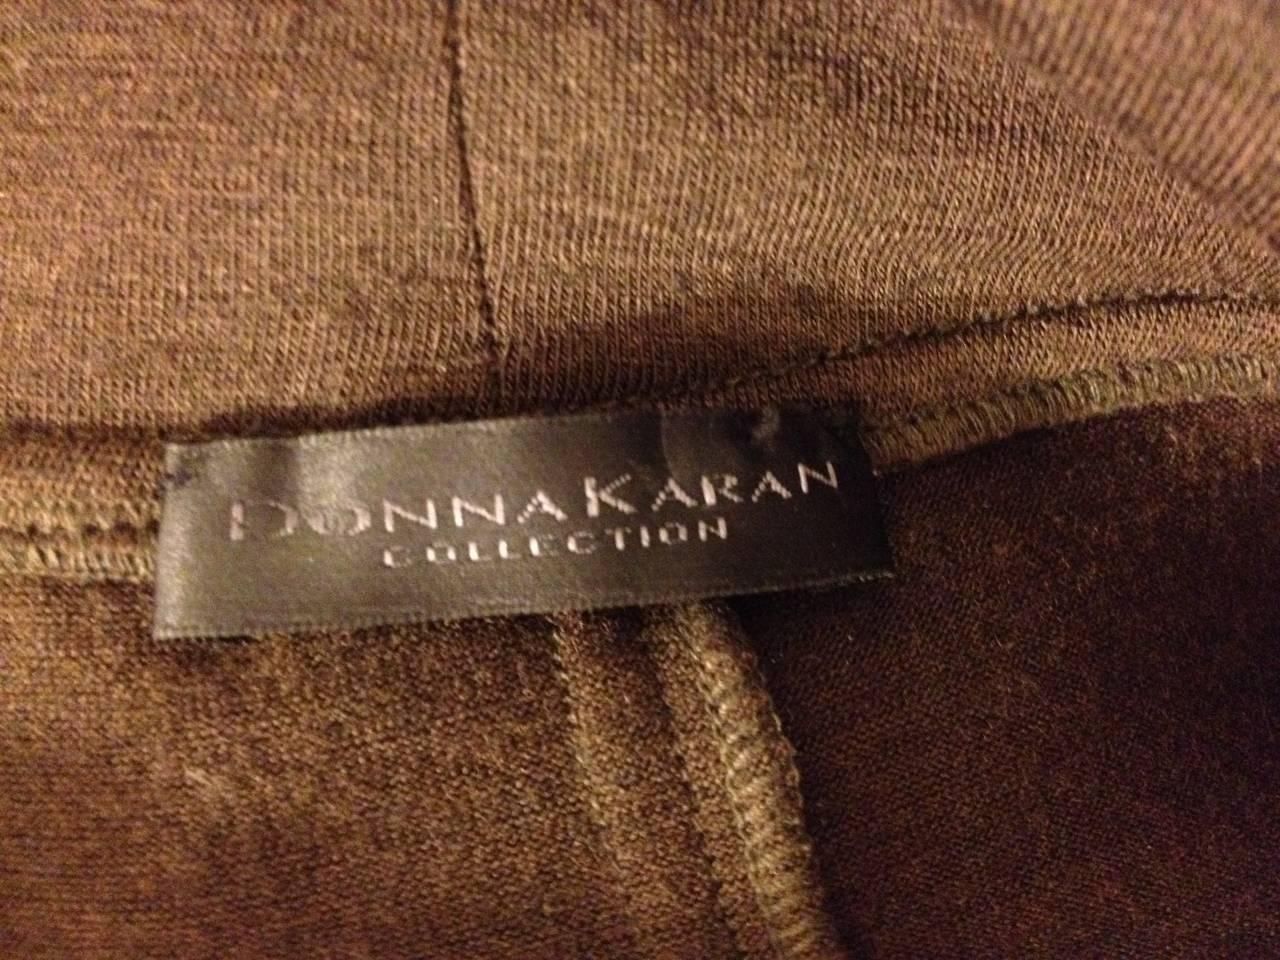 Donna Karan Brown Knit Wrap Dress with Flower 6